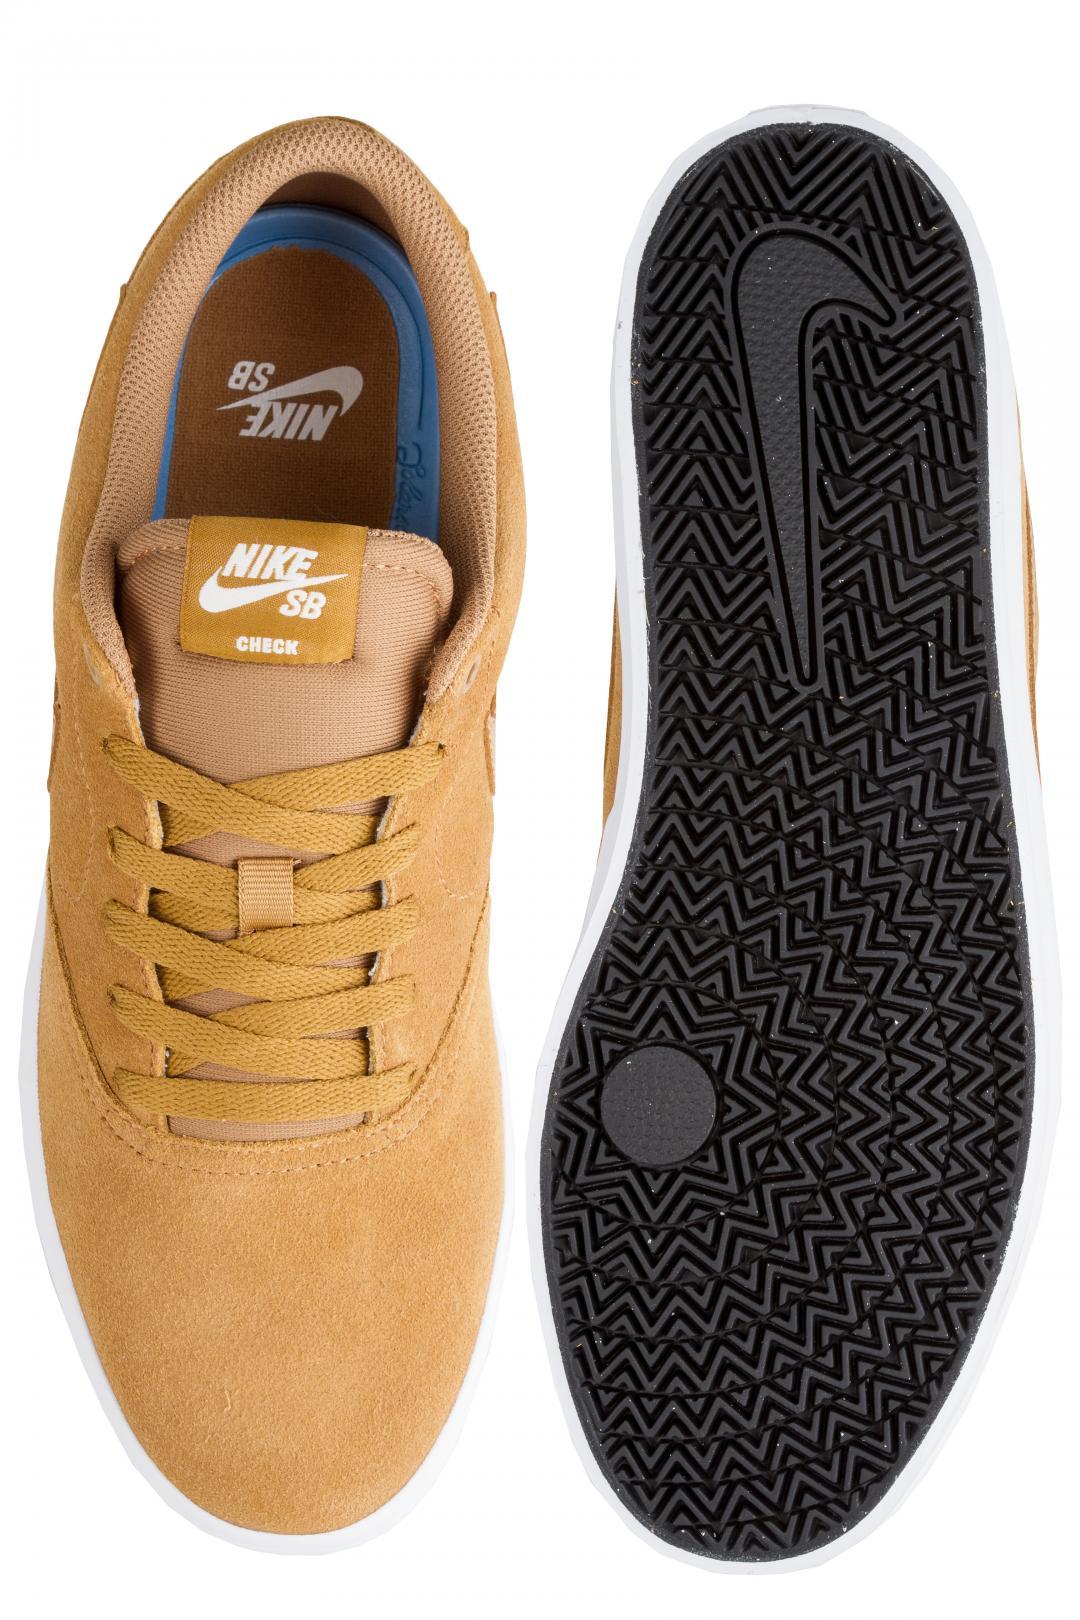 Uomo Nike SB Check Solarsoft wheat phantom | Sneakers low top